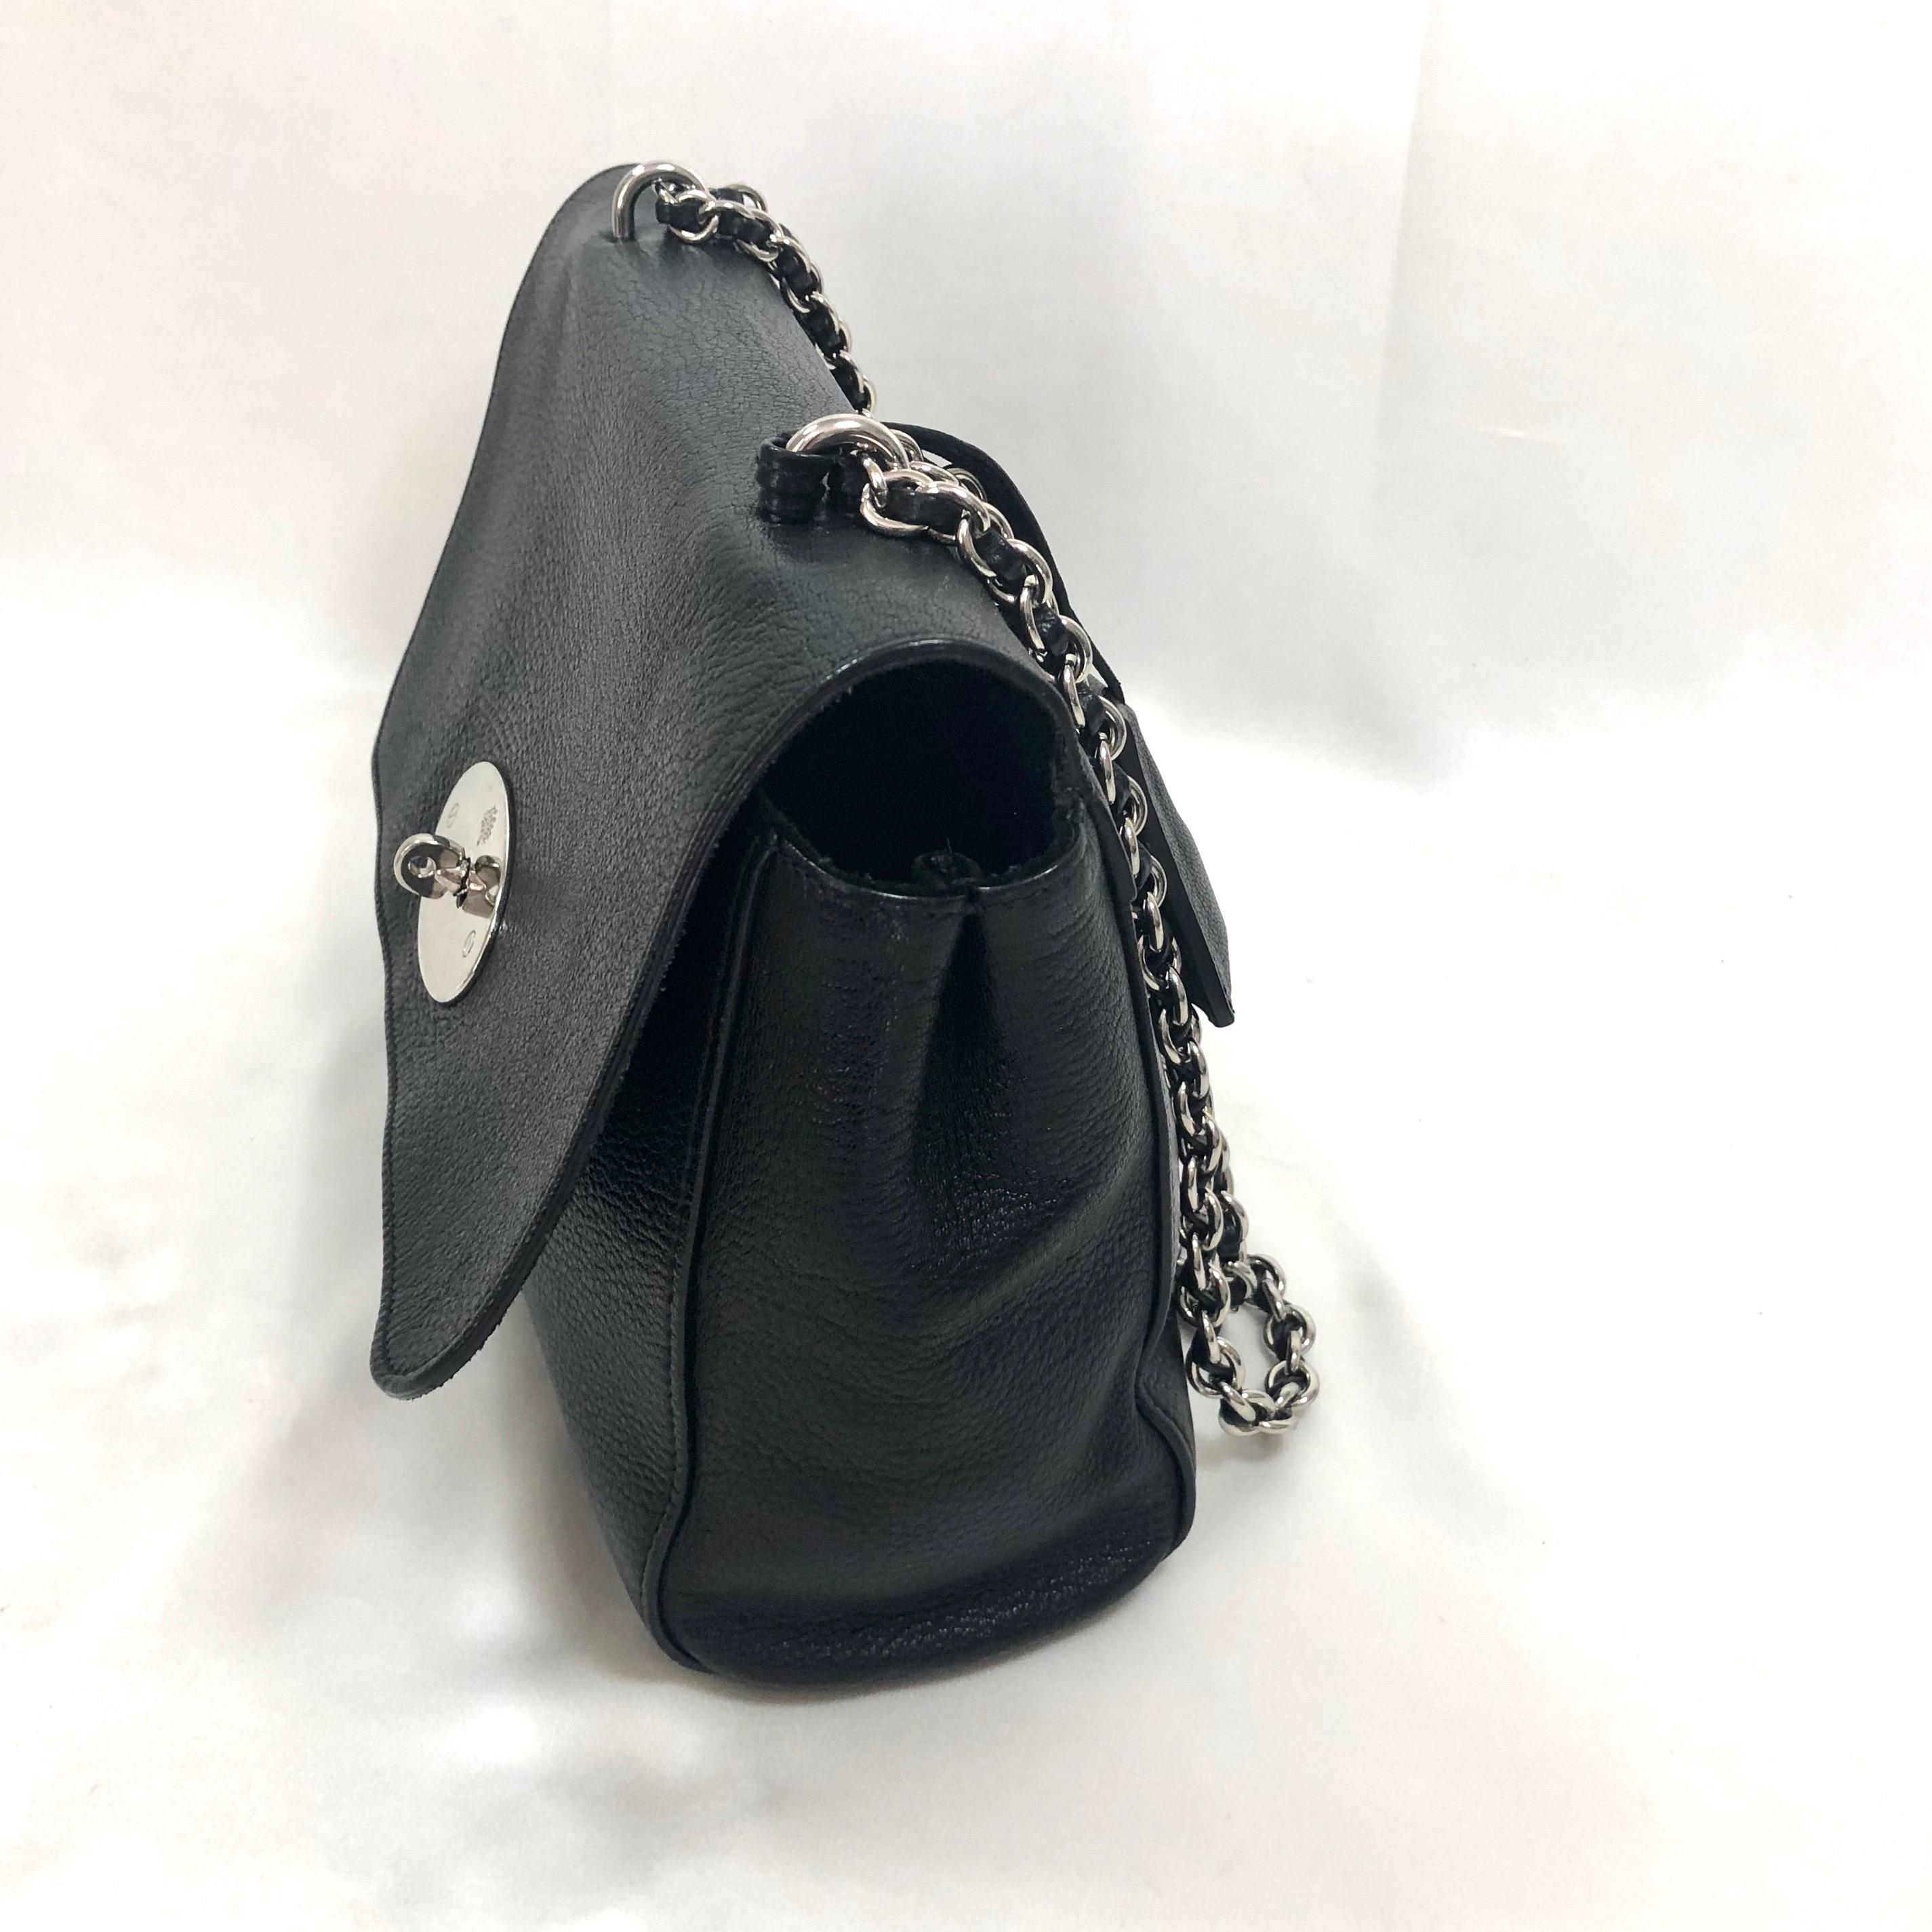 3aef57cdb329 ... netherlands mulberry lily shoulder bag size m still in fashion 57968  d9739